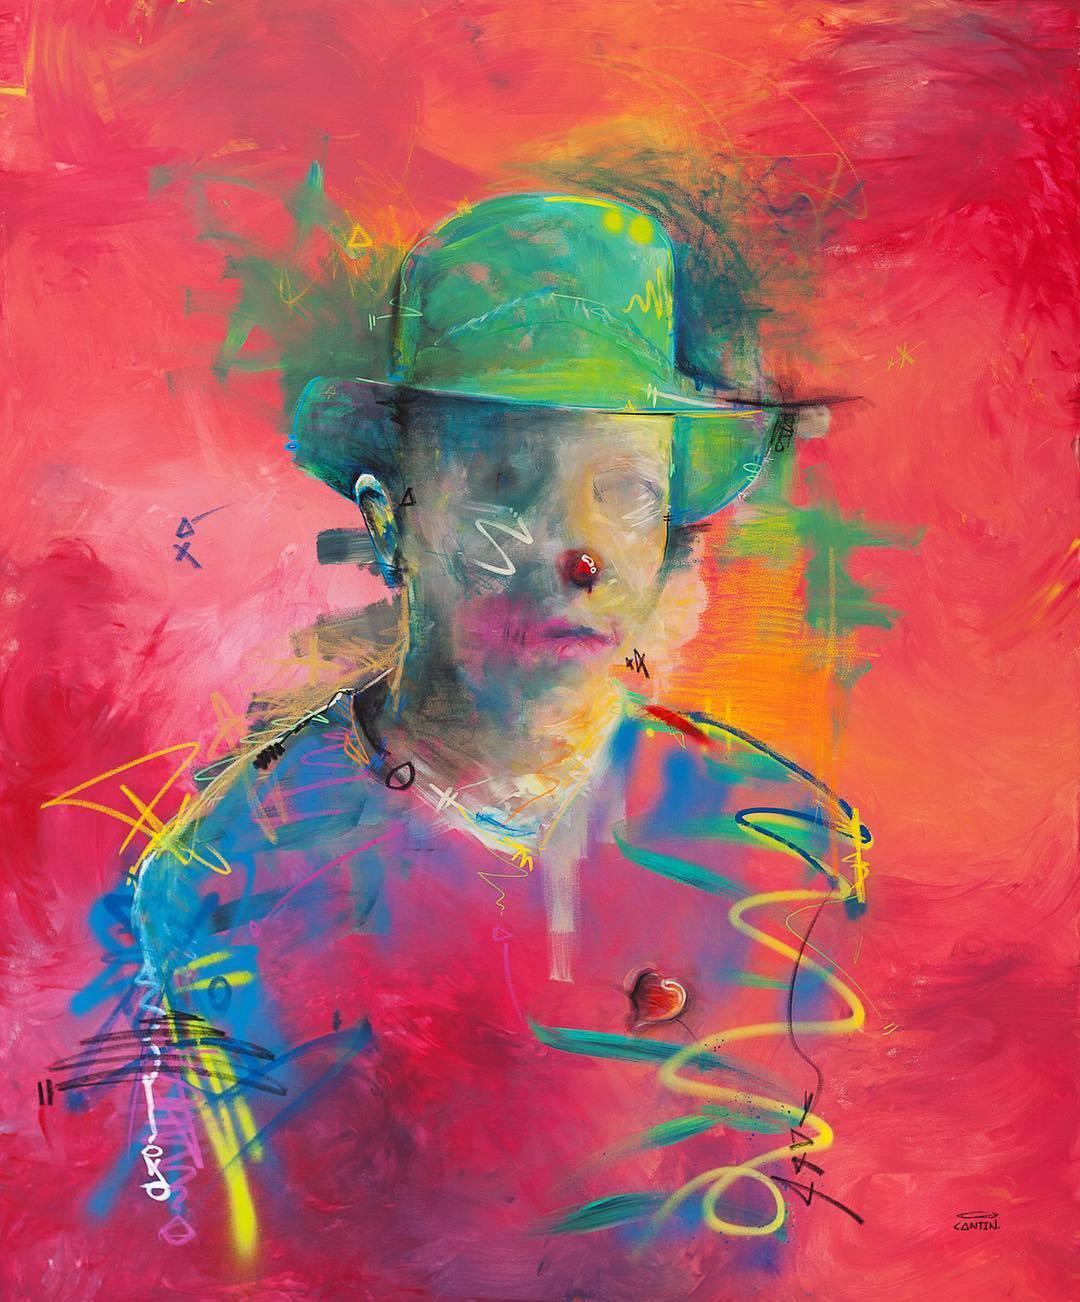 Pat Cantin Artist / Fuman